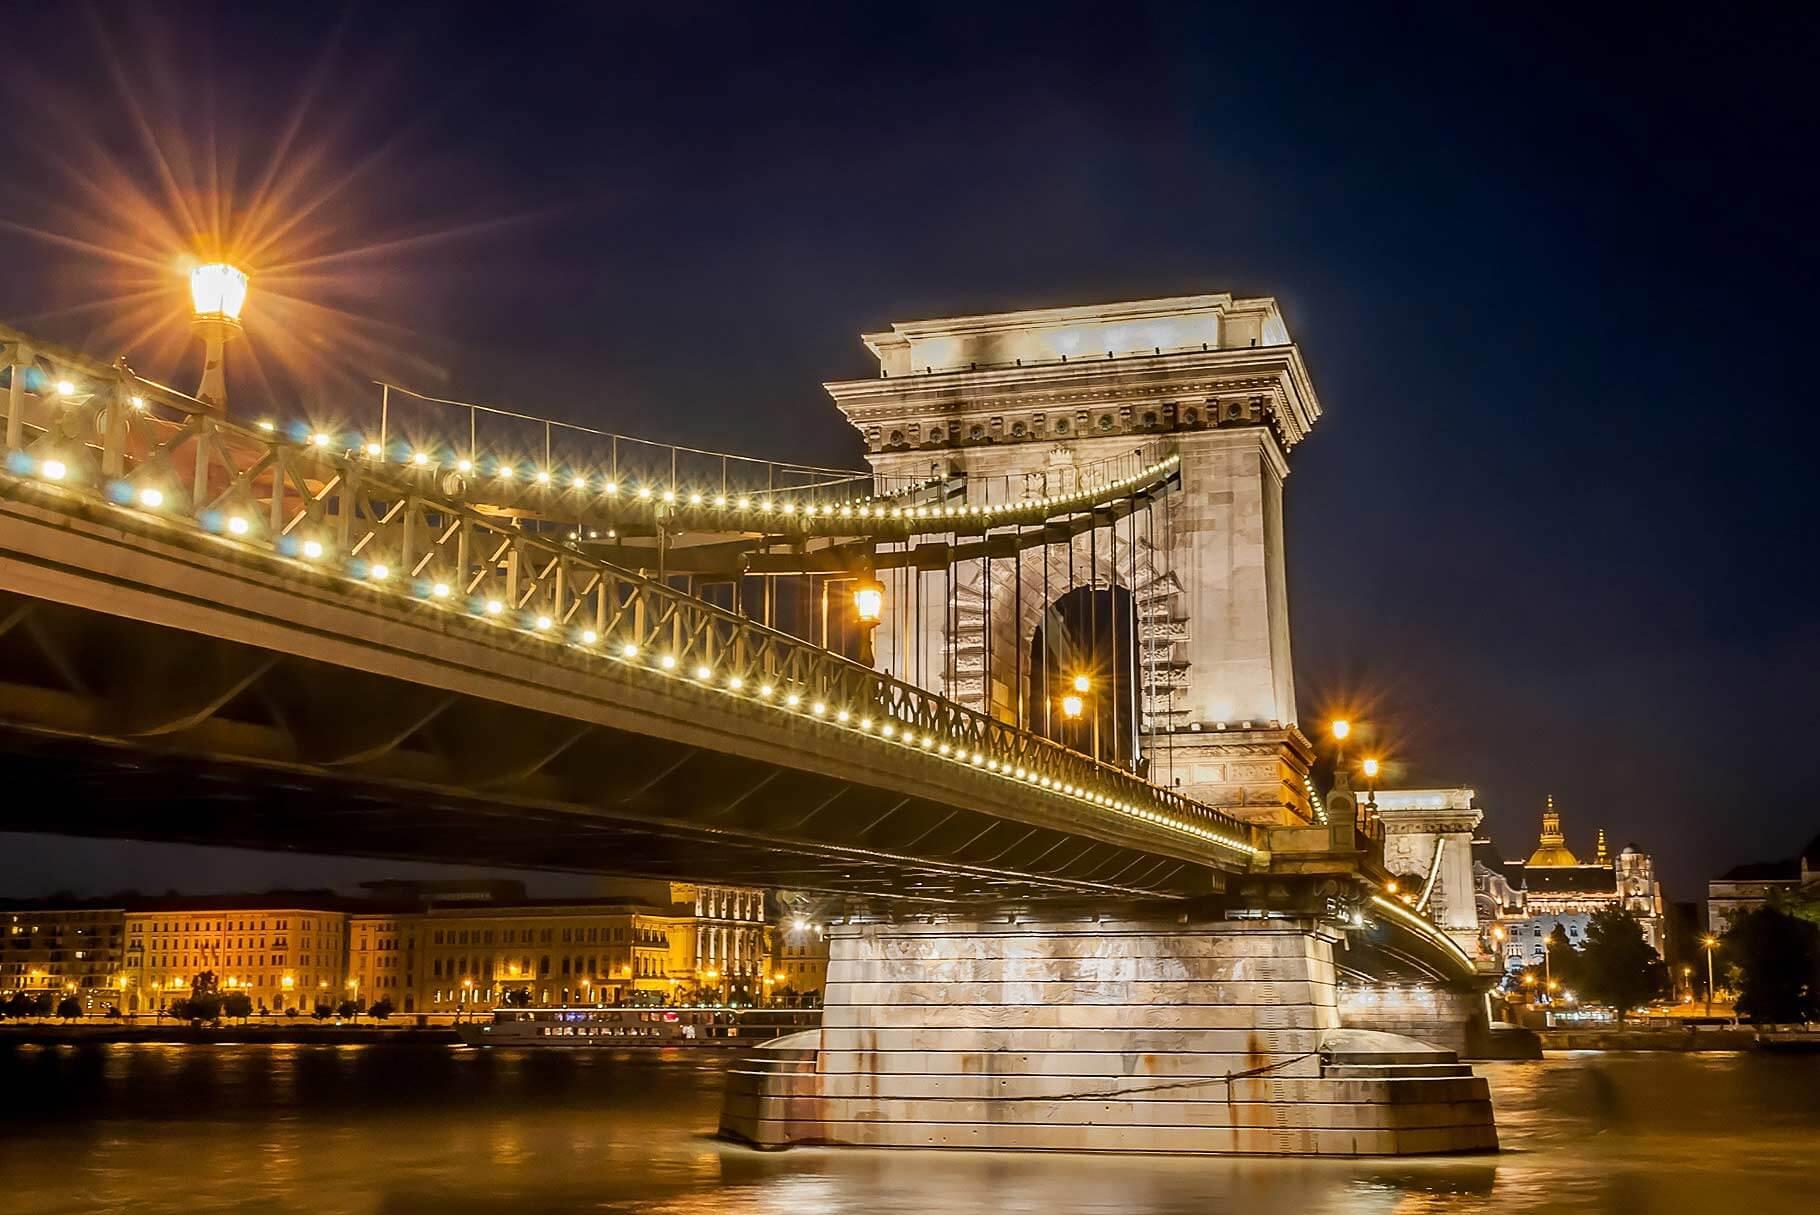 جسر تشين بريدج